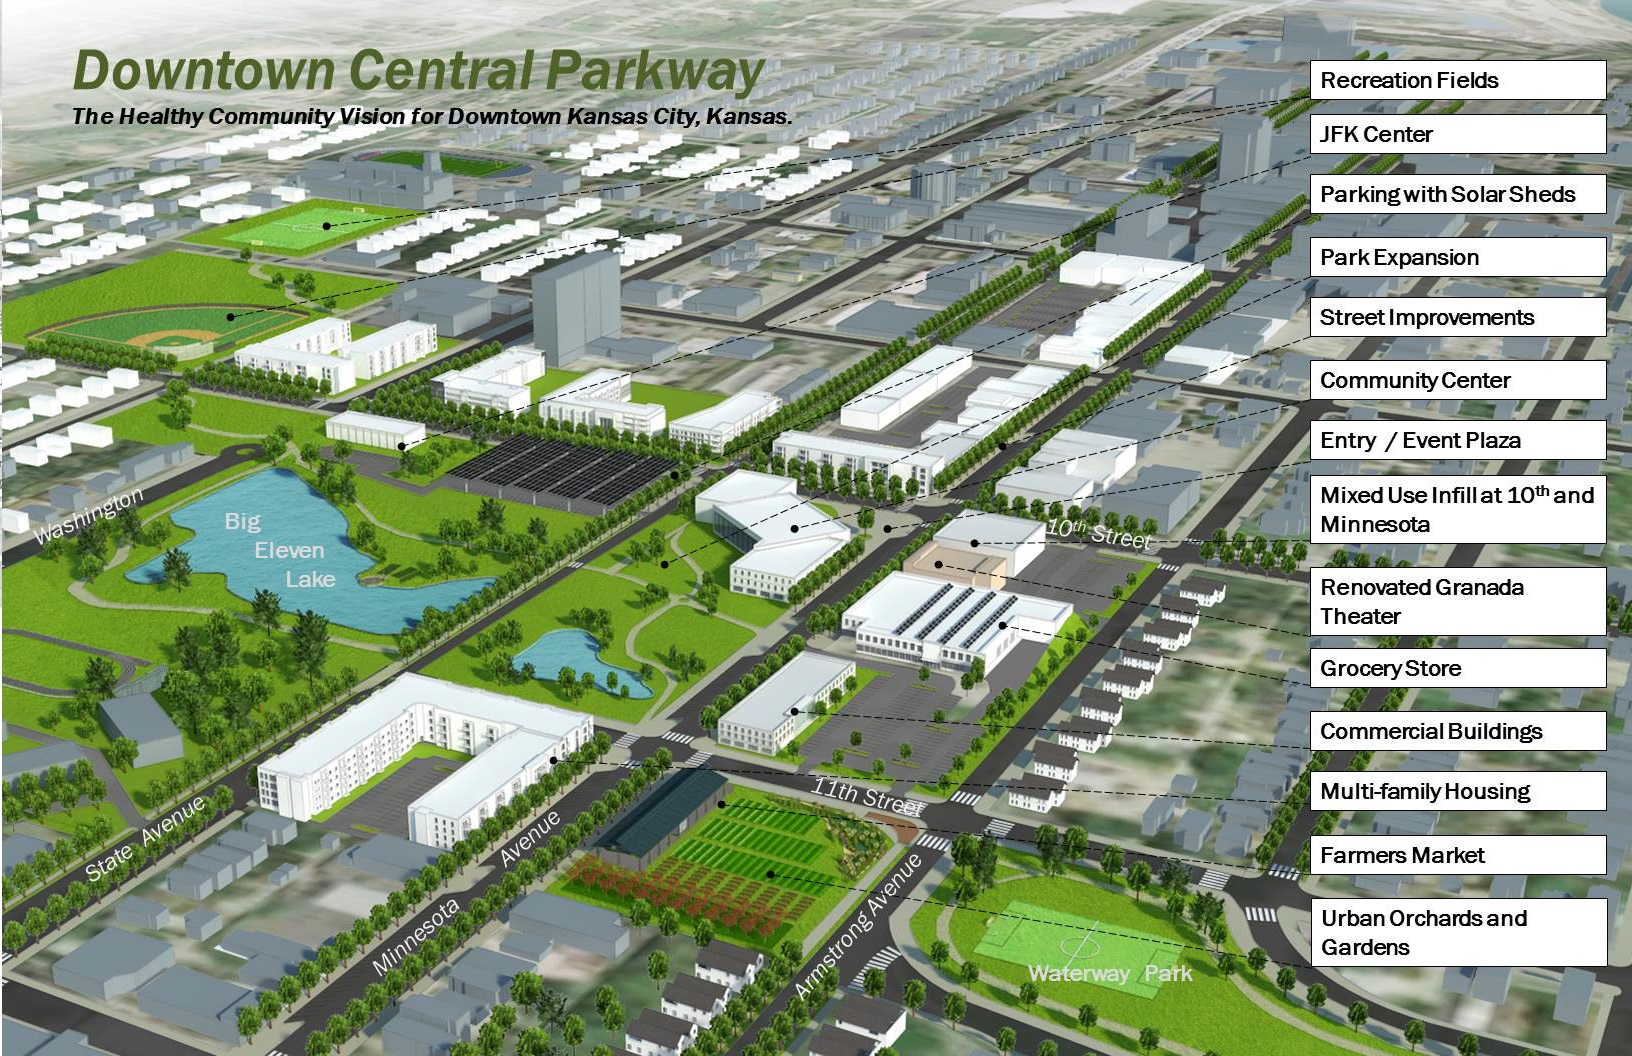 The master redevelopment plan for downtown Kansas City, Kan.